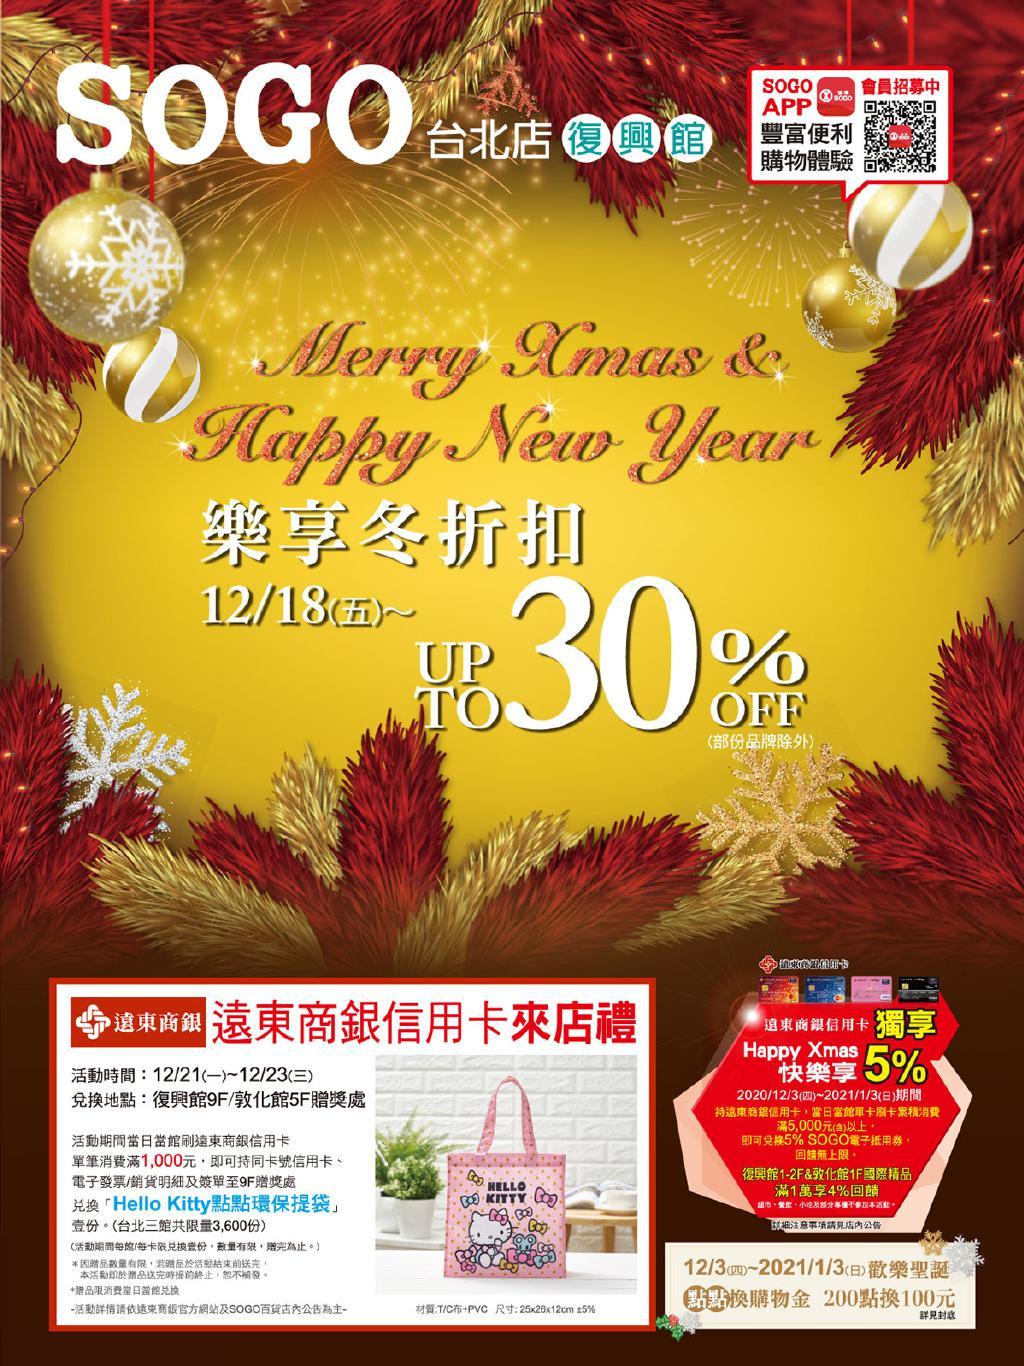 SOGO《台北敦化館》DM 「Merry Xmas & Happy New Year 樂享冬折扣 UP TO 30% OFF」【2021/1/3 止】